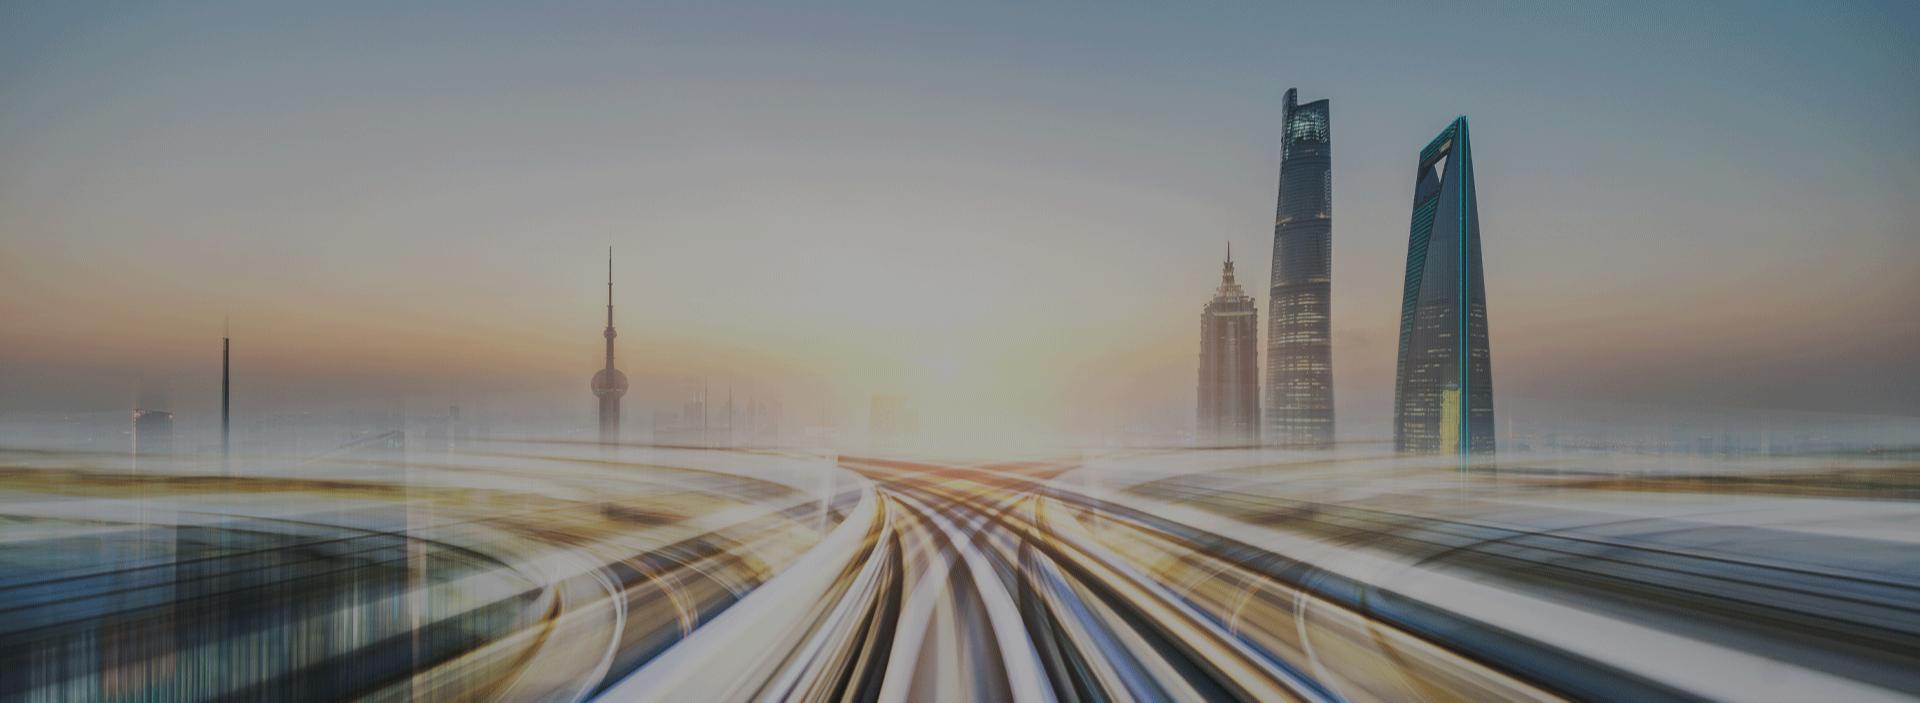 N-iX named to 2020 CRN Fast Growth 150 List